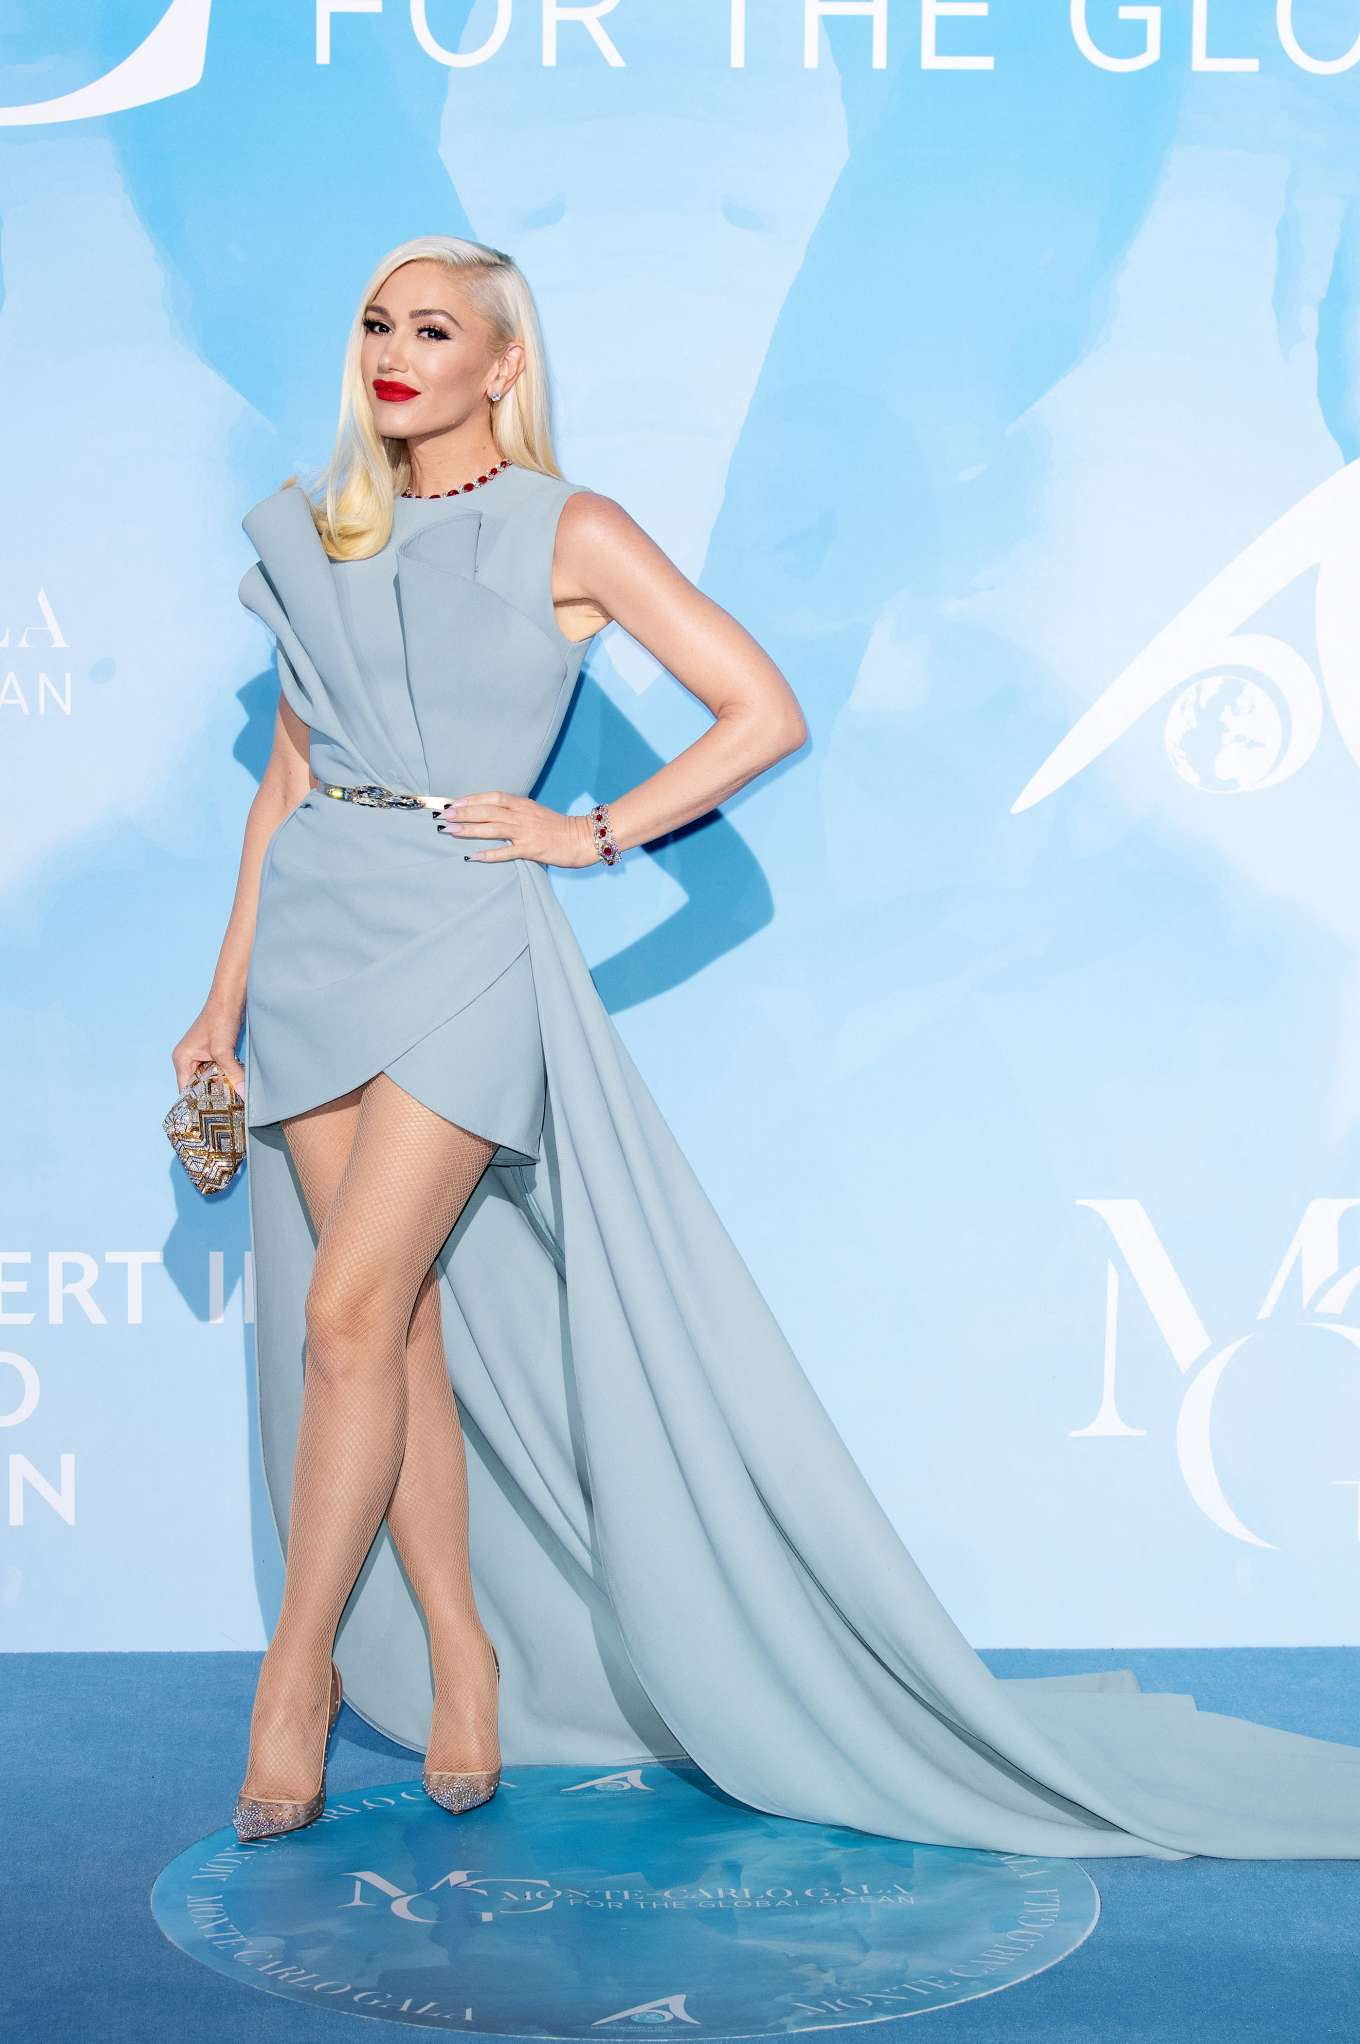 Gwen Stefani - 2019 Gala for the Global Ocean in Monte-Carlo